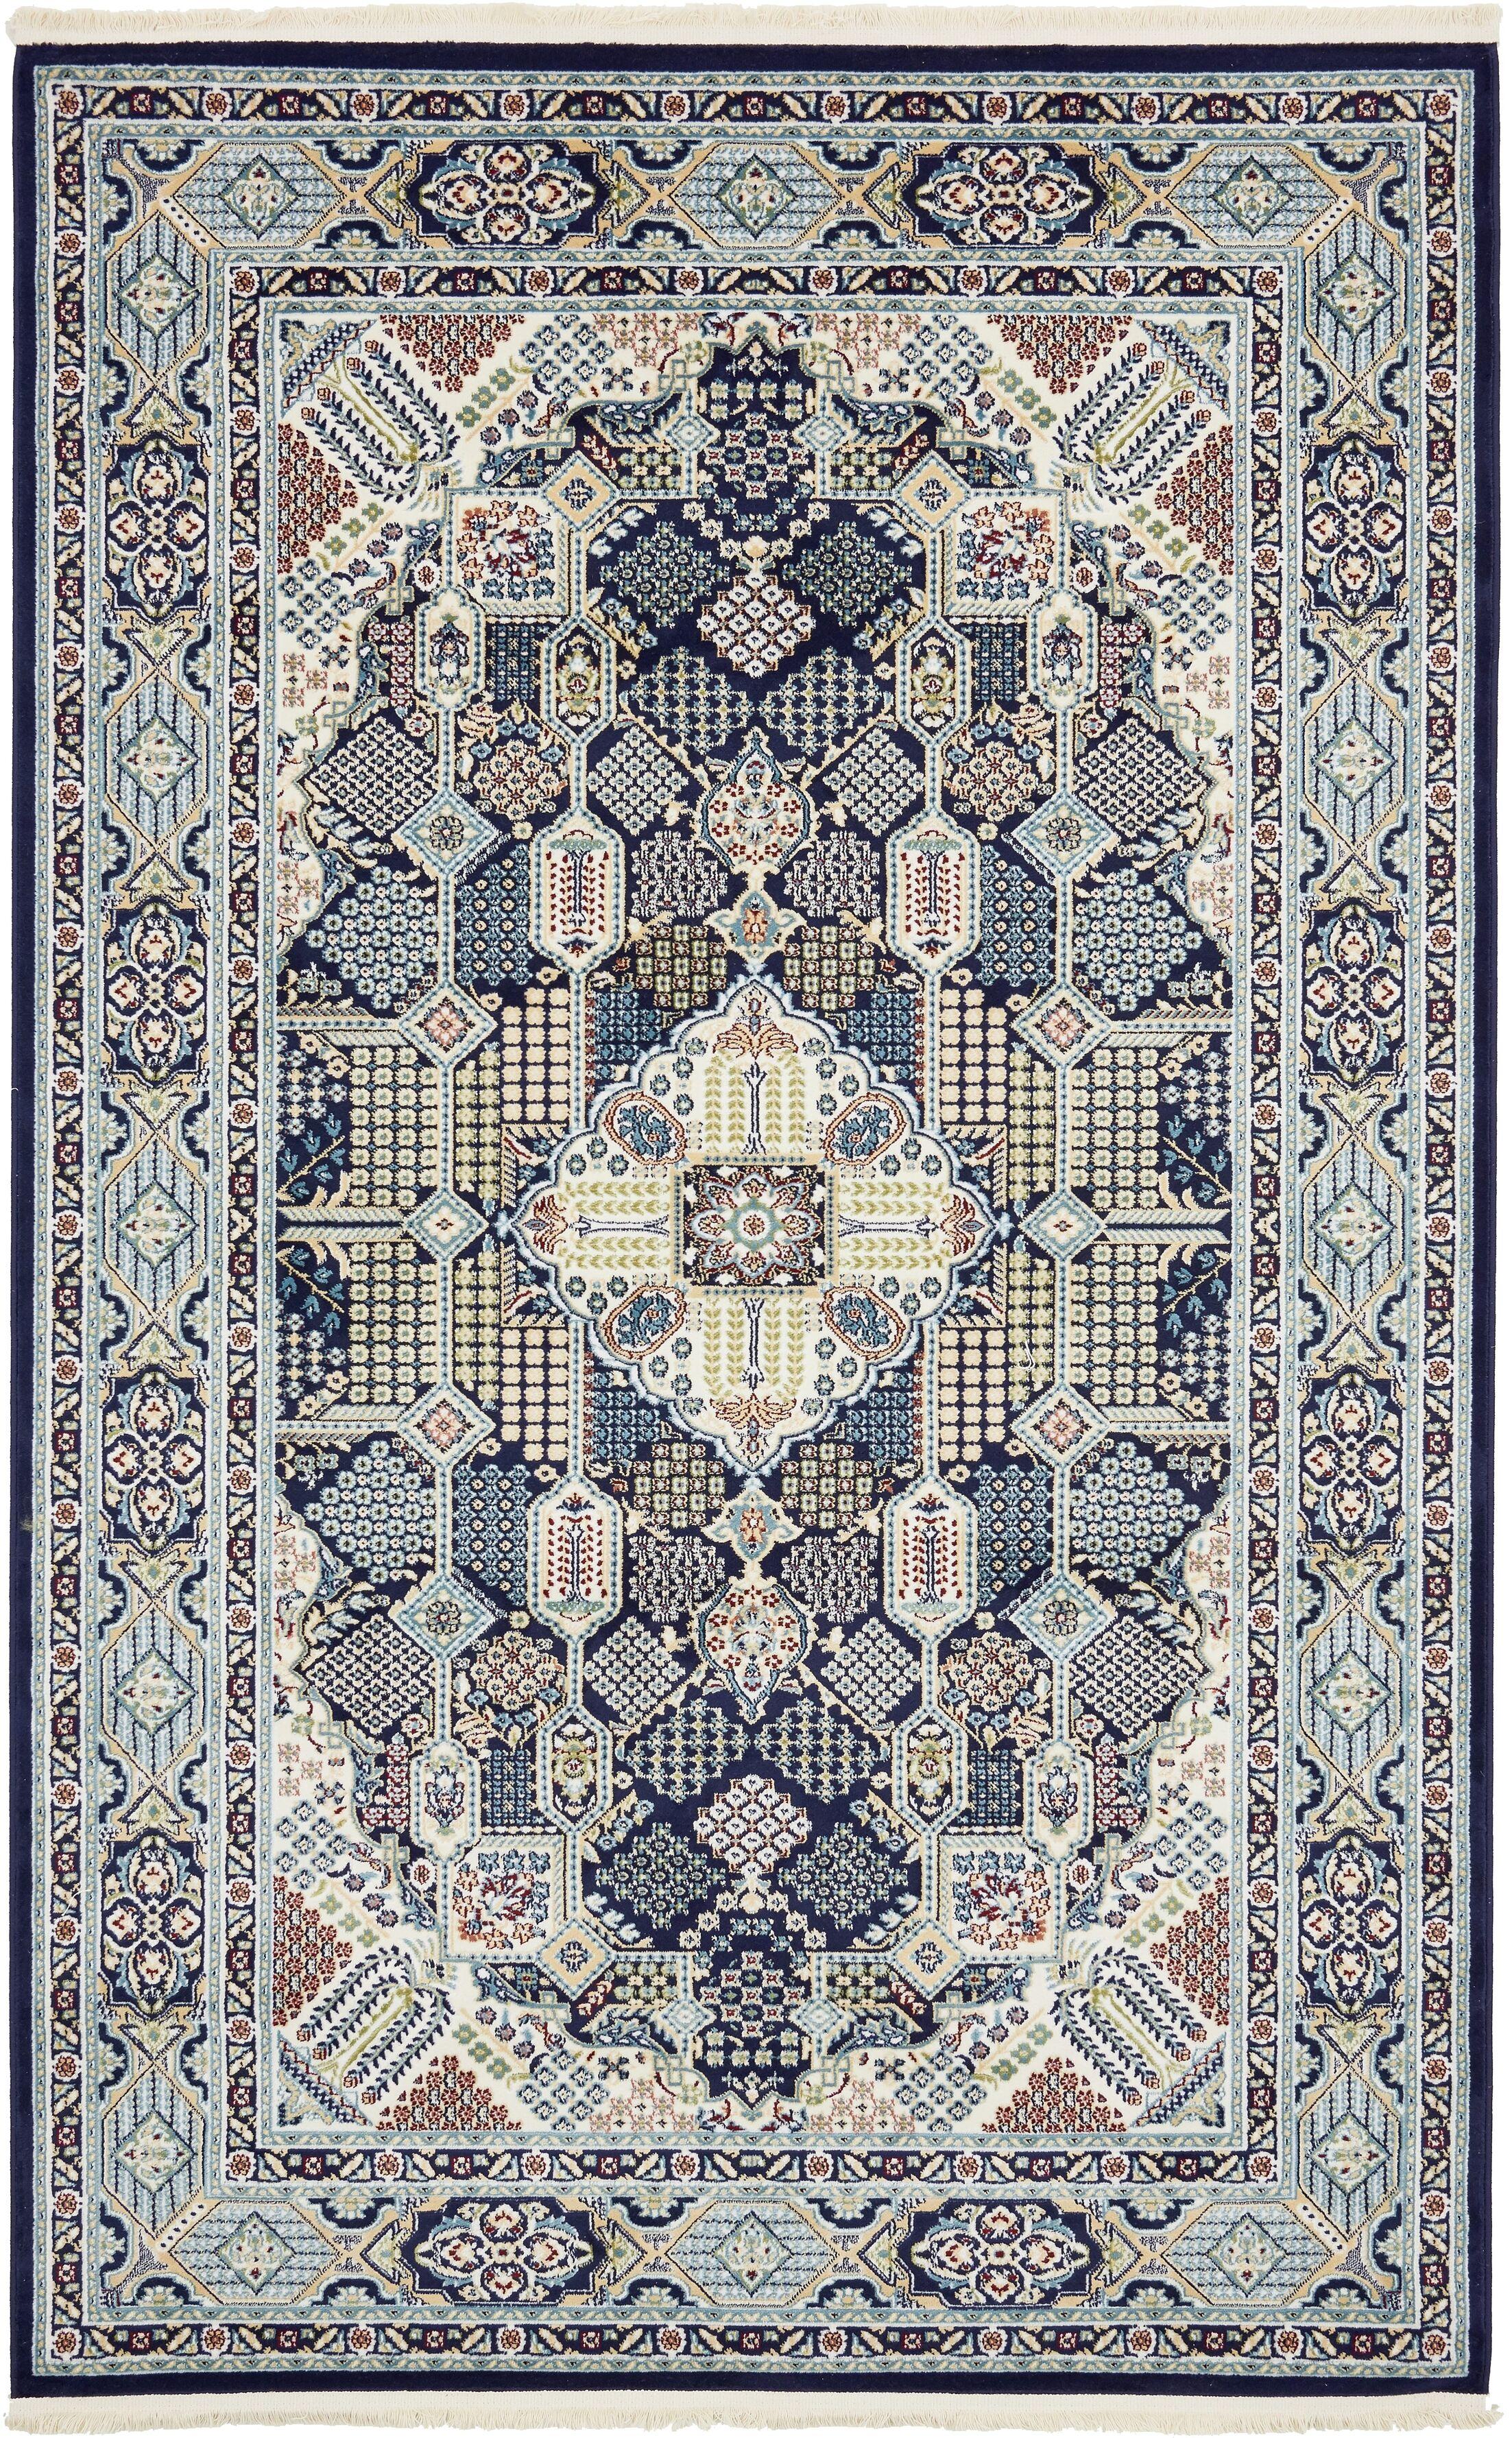 Jackson Navy Blue Area Rug Rug Size: Rectangle 5' x 8'